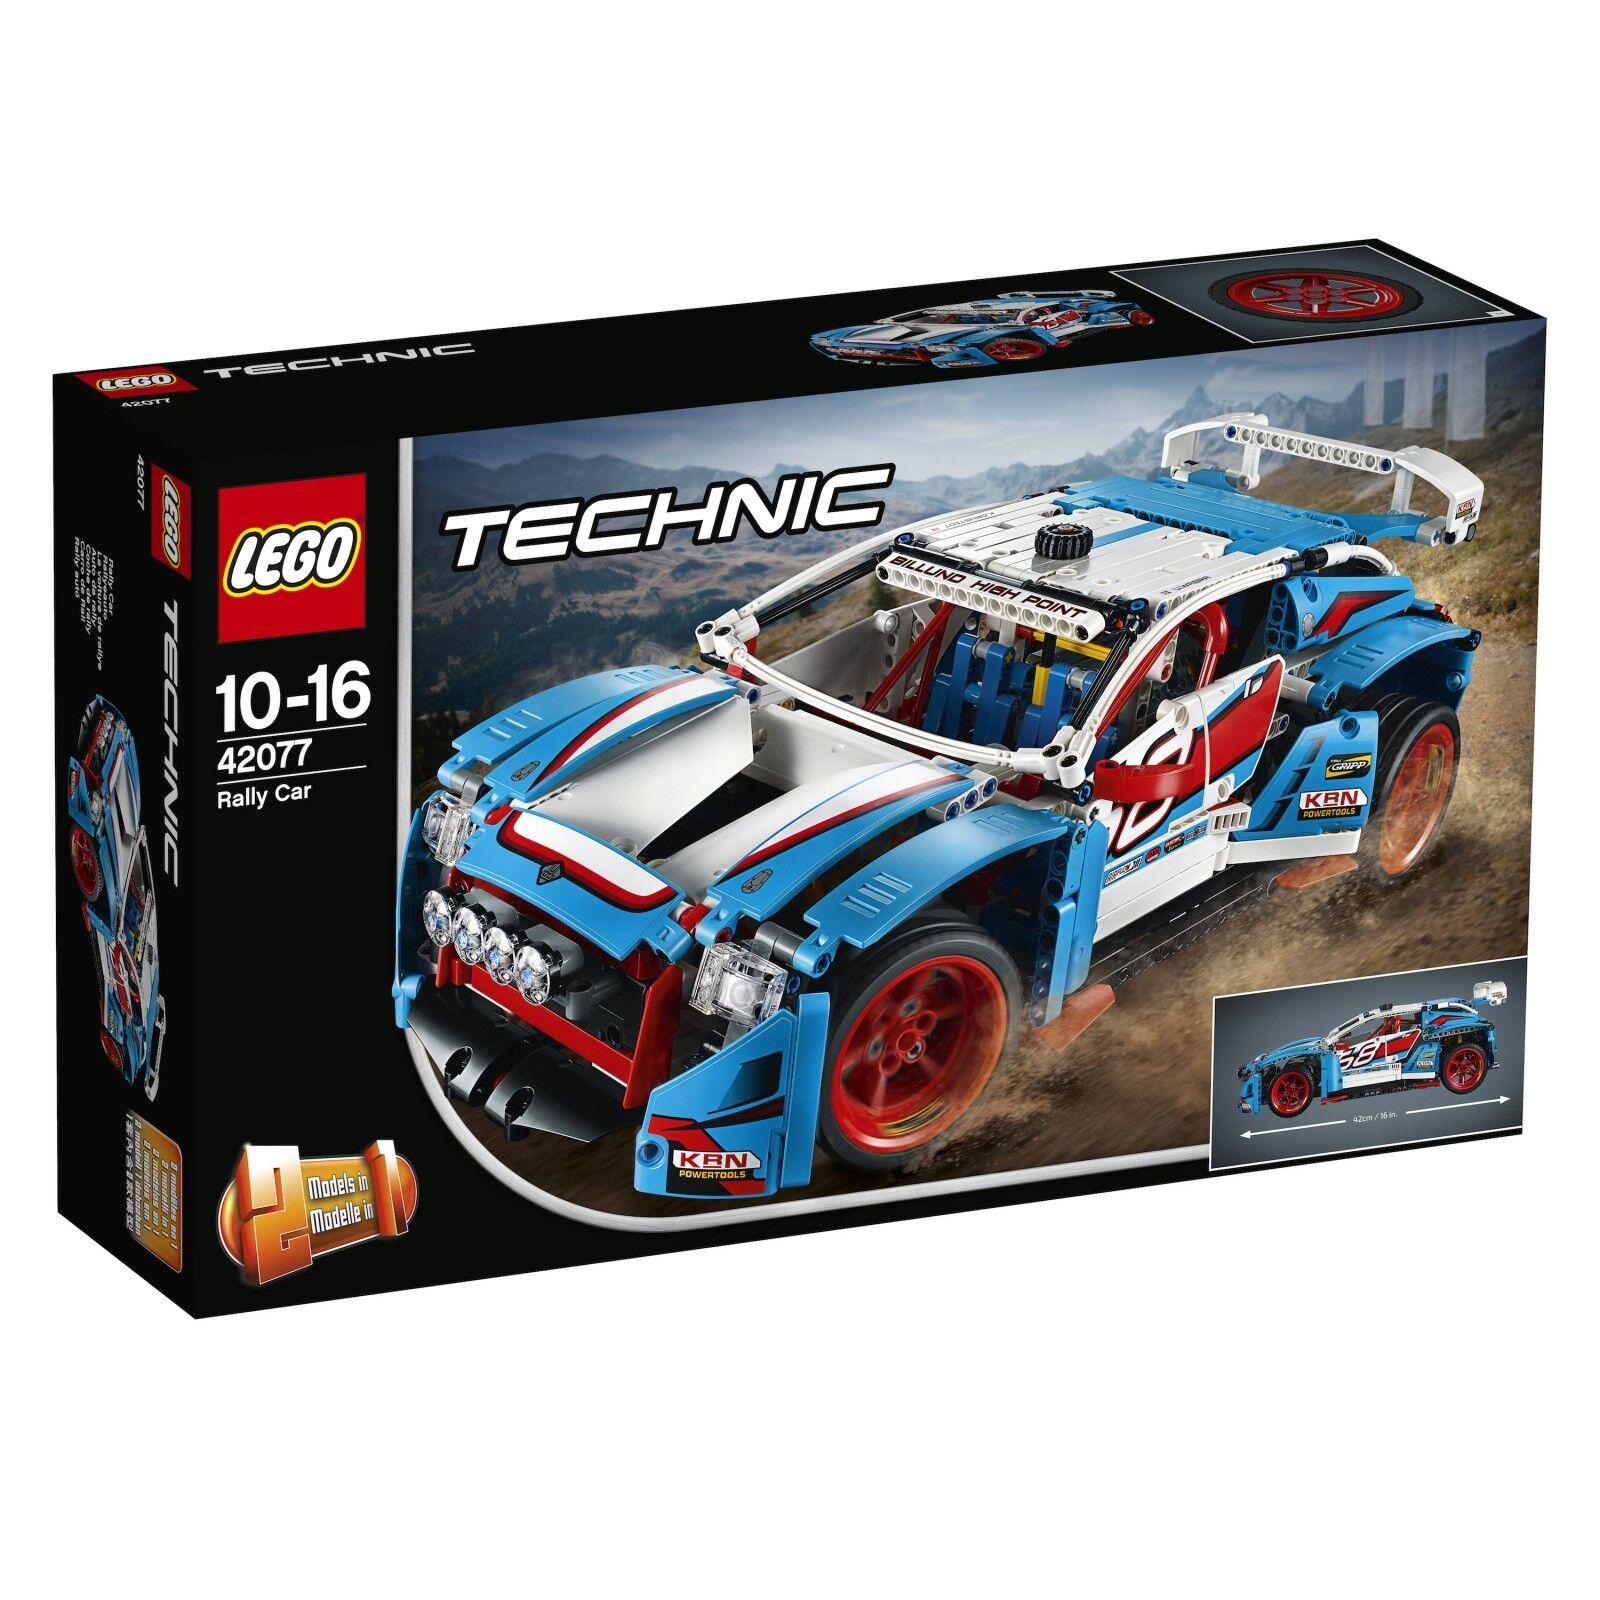 LEGO® Technic 42077 Rallyeauto _ Rally Car NEW MISB NRFB